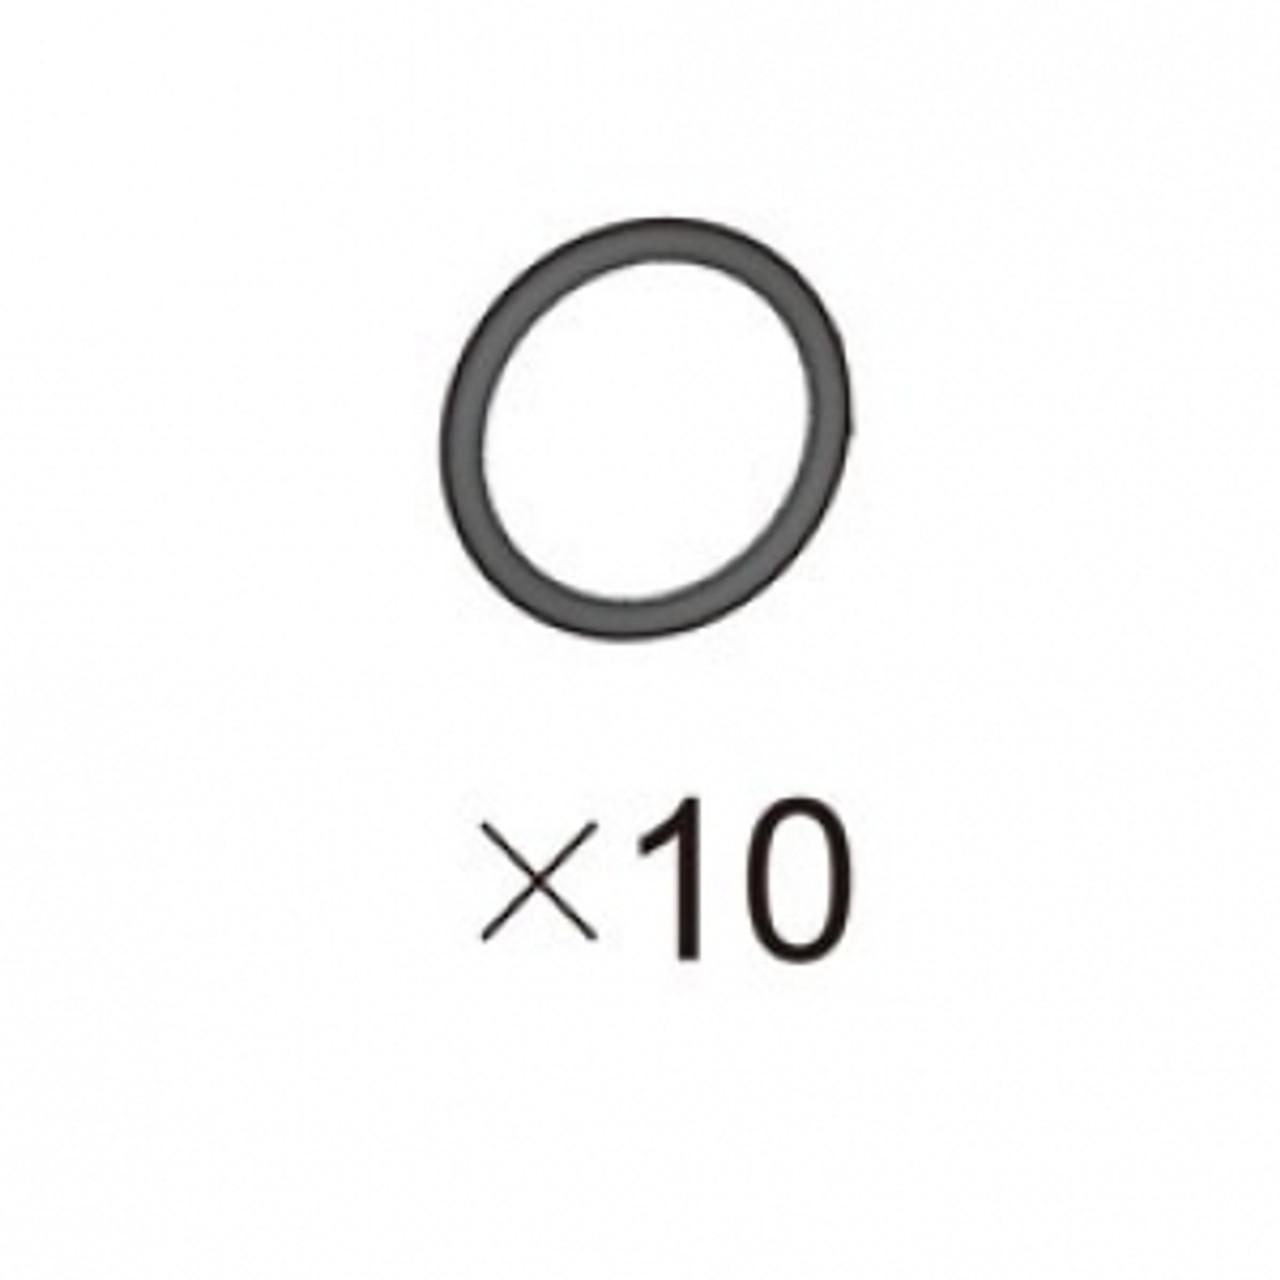 Tire-S (STR-20(K)) 10pcs